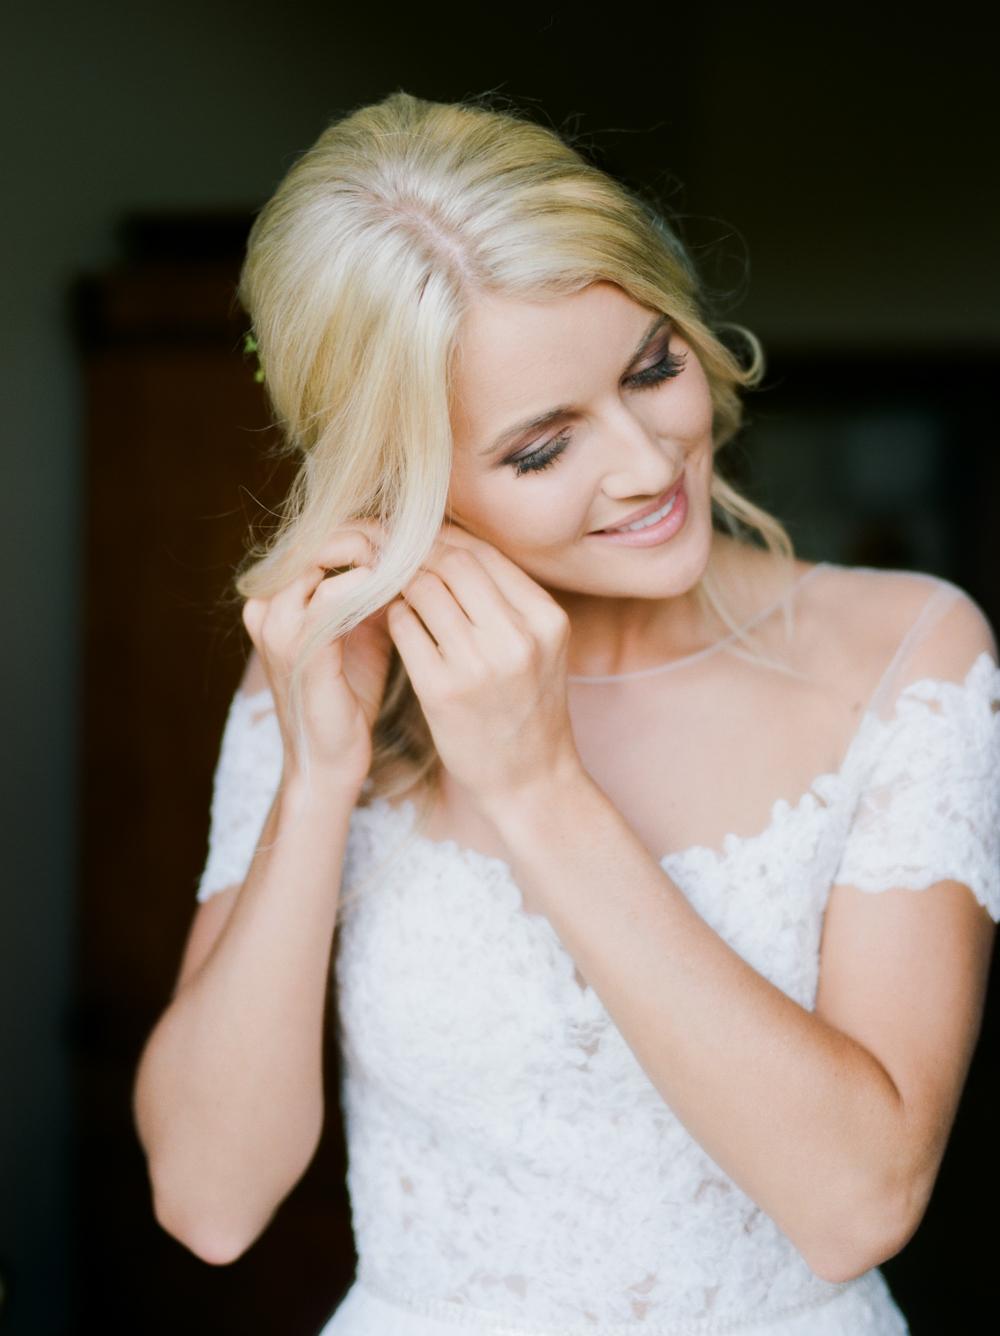 Bostick-Durham-Wedding-169.jpg